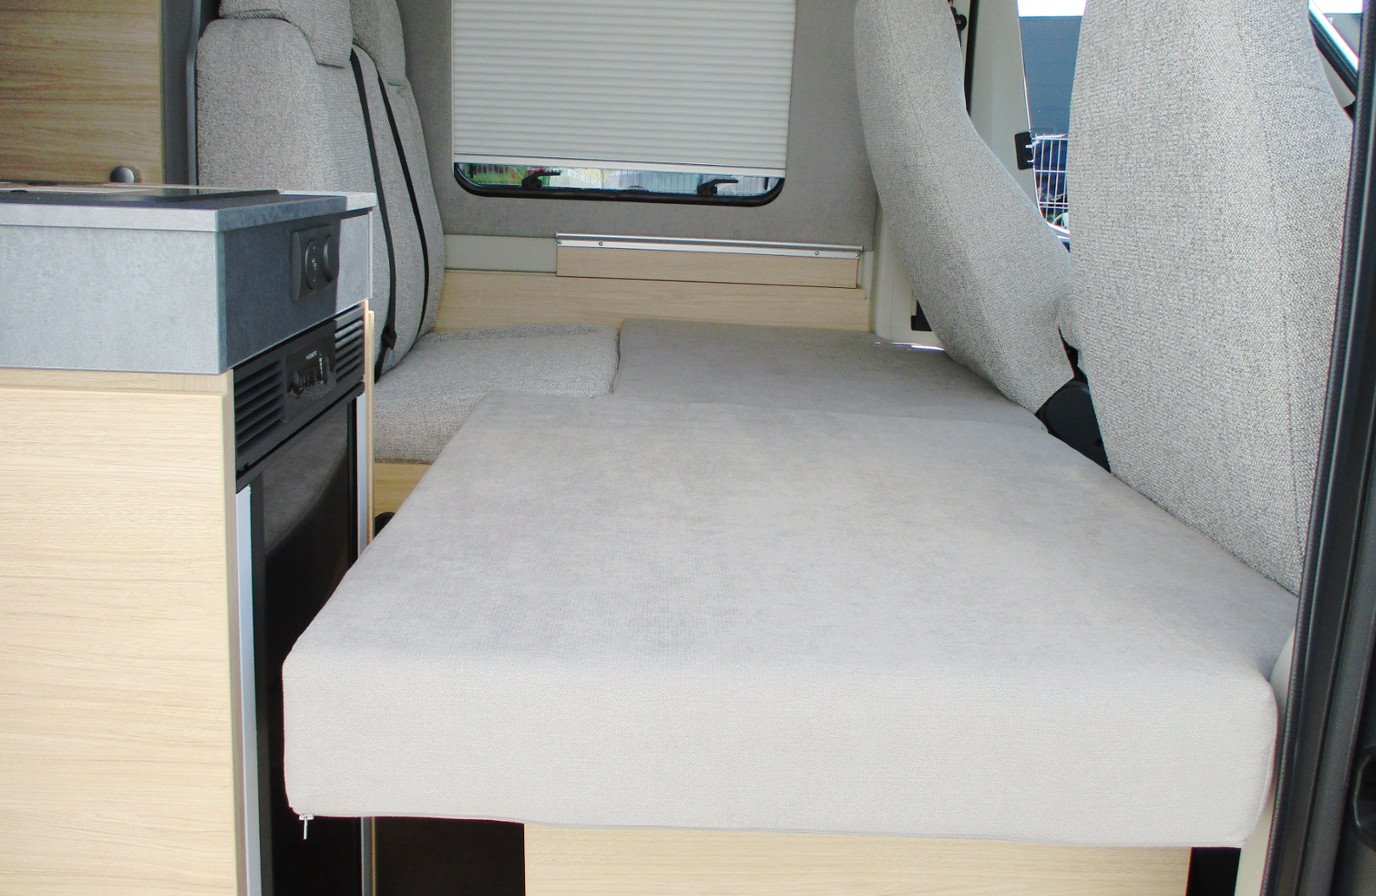 Wohnmobil mieten- PÖSSL 2WIN Plus 3. Schlafplatz